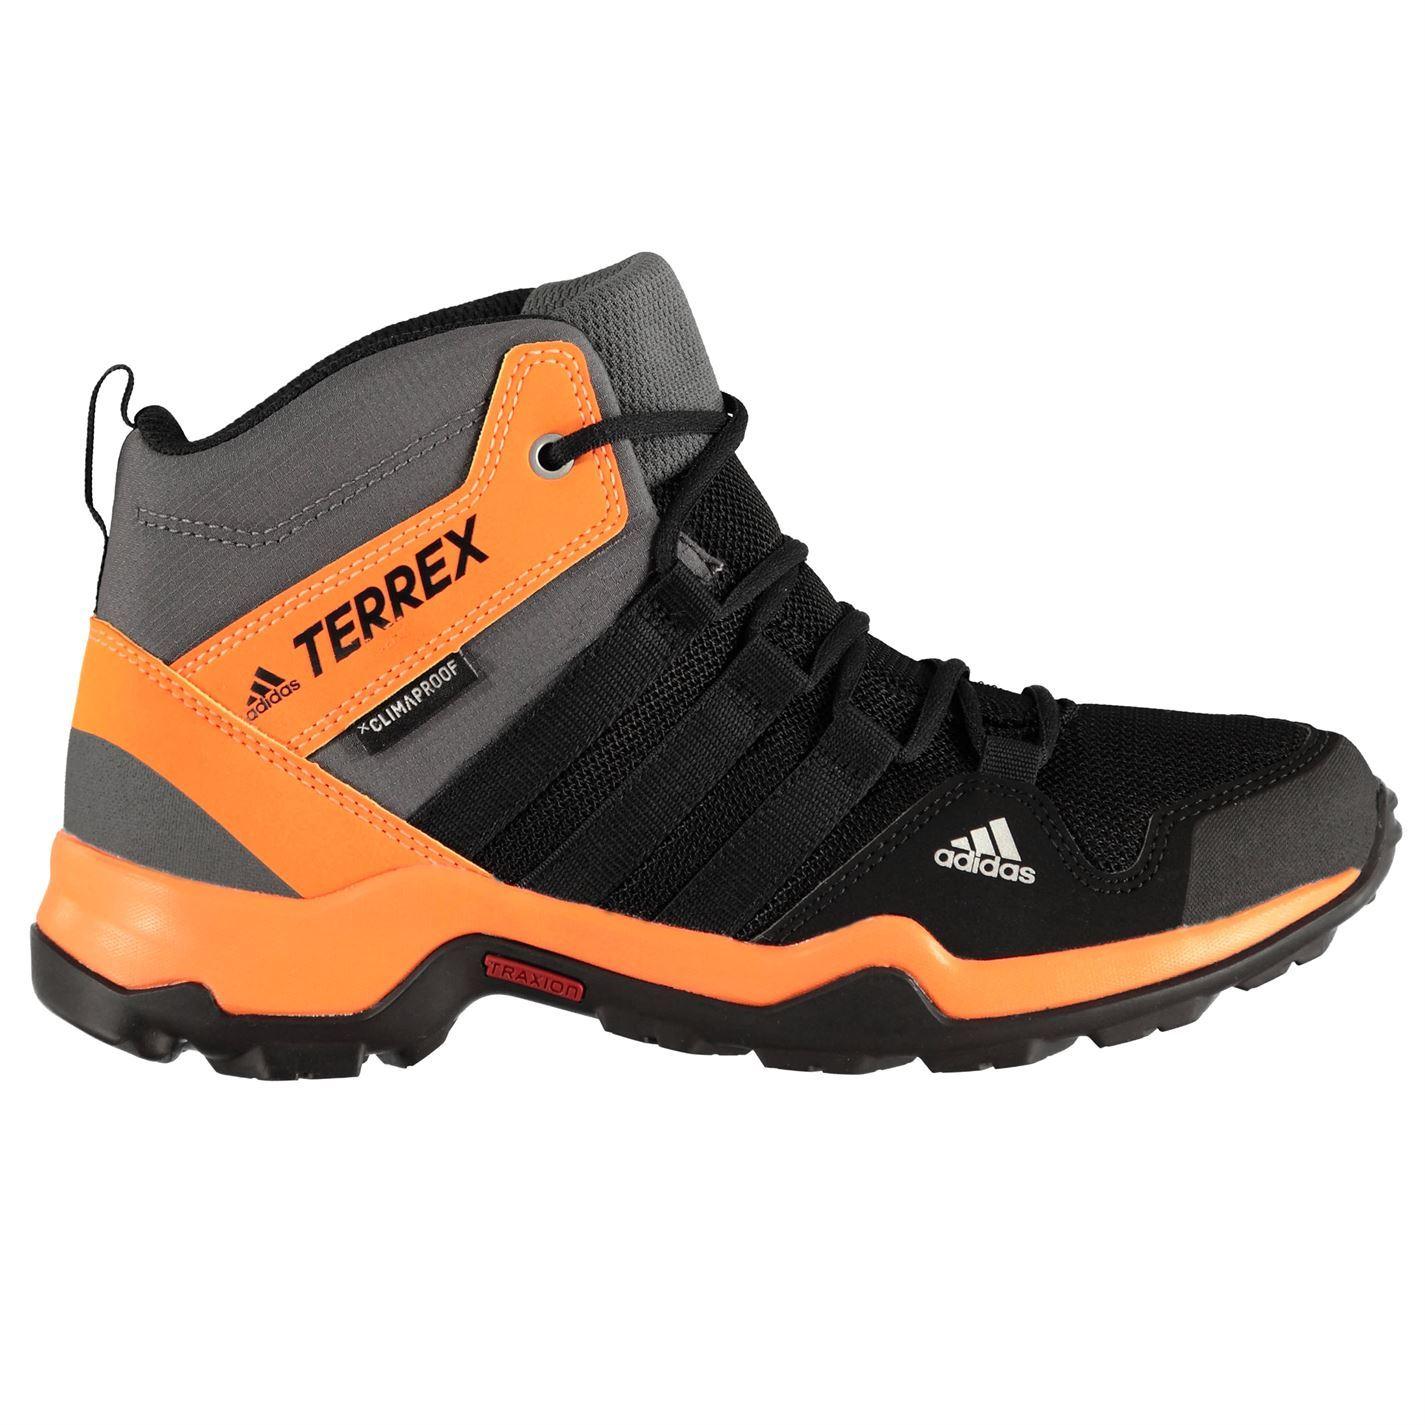 D'origine Afficher Titre Garçons Boots Chaussures Ax2r Noirorange Walking Junior Terrex Détails Randonnée Le Sur Trekking Adidas OnN8PX0wk